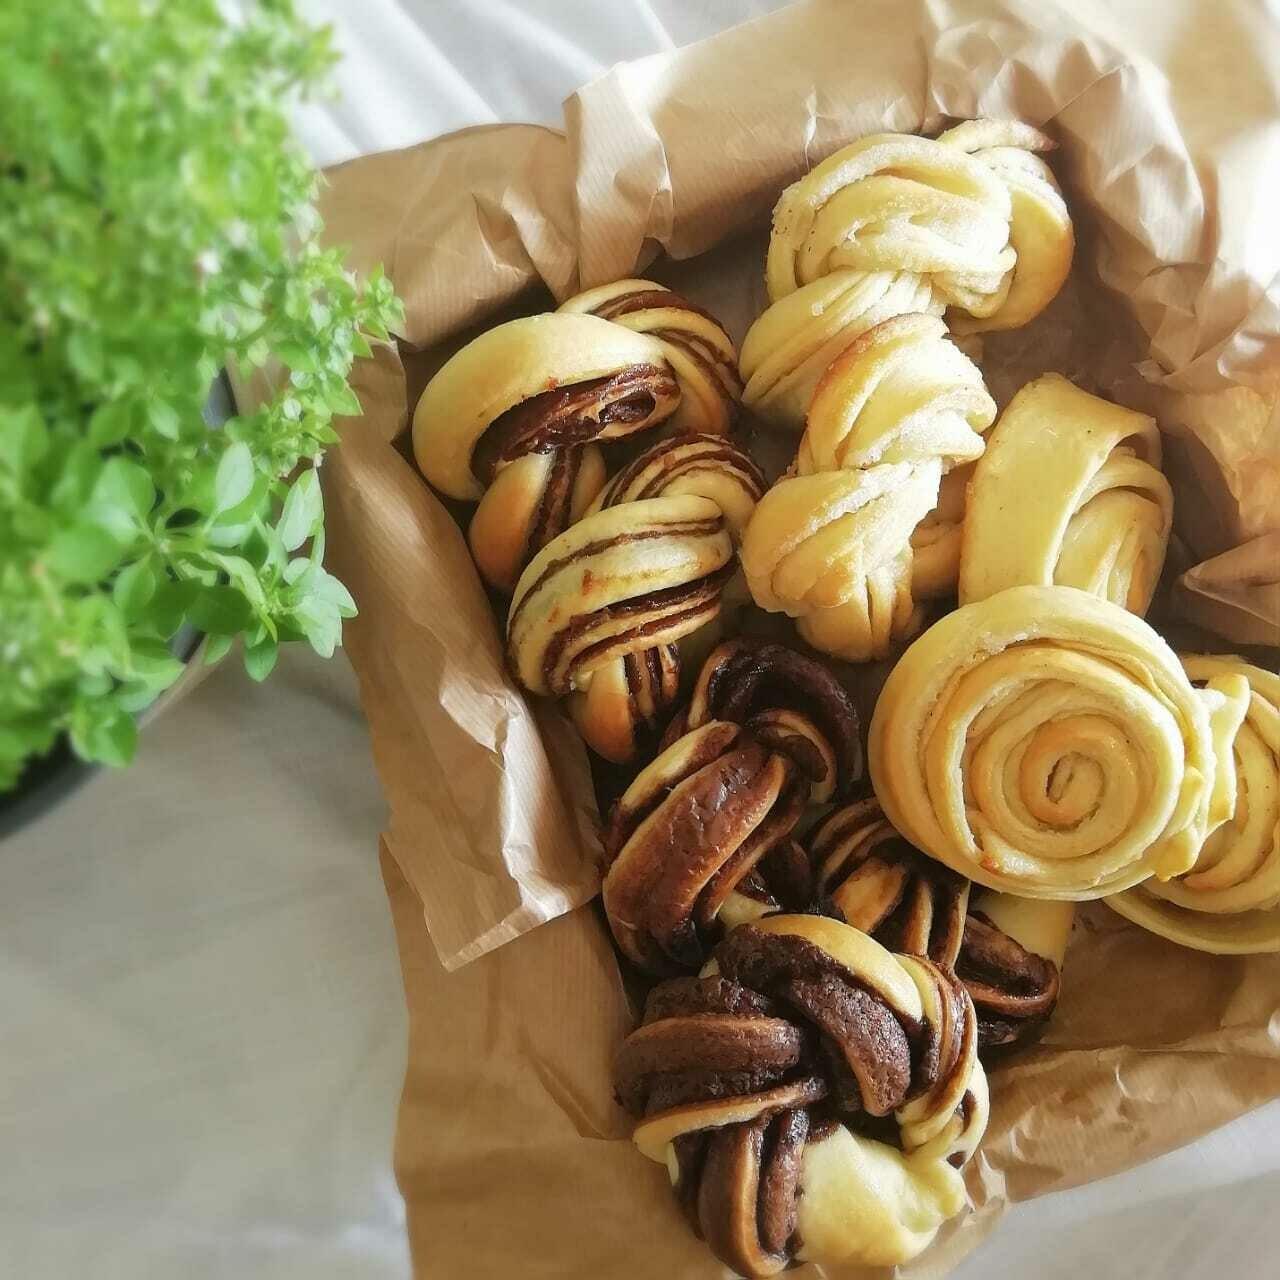 Babka Bread (Pack) - Nuturals